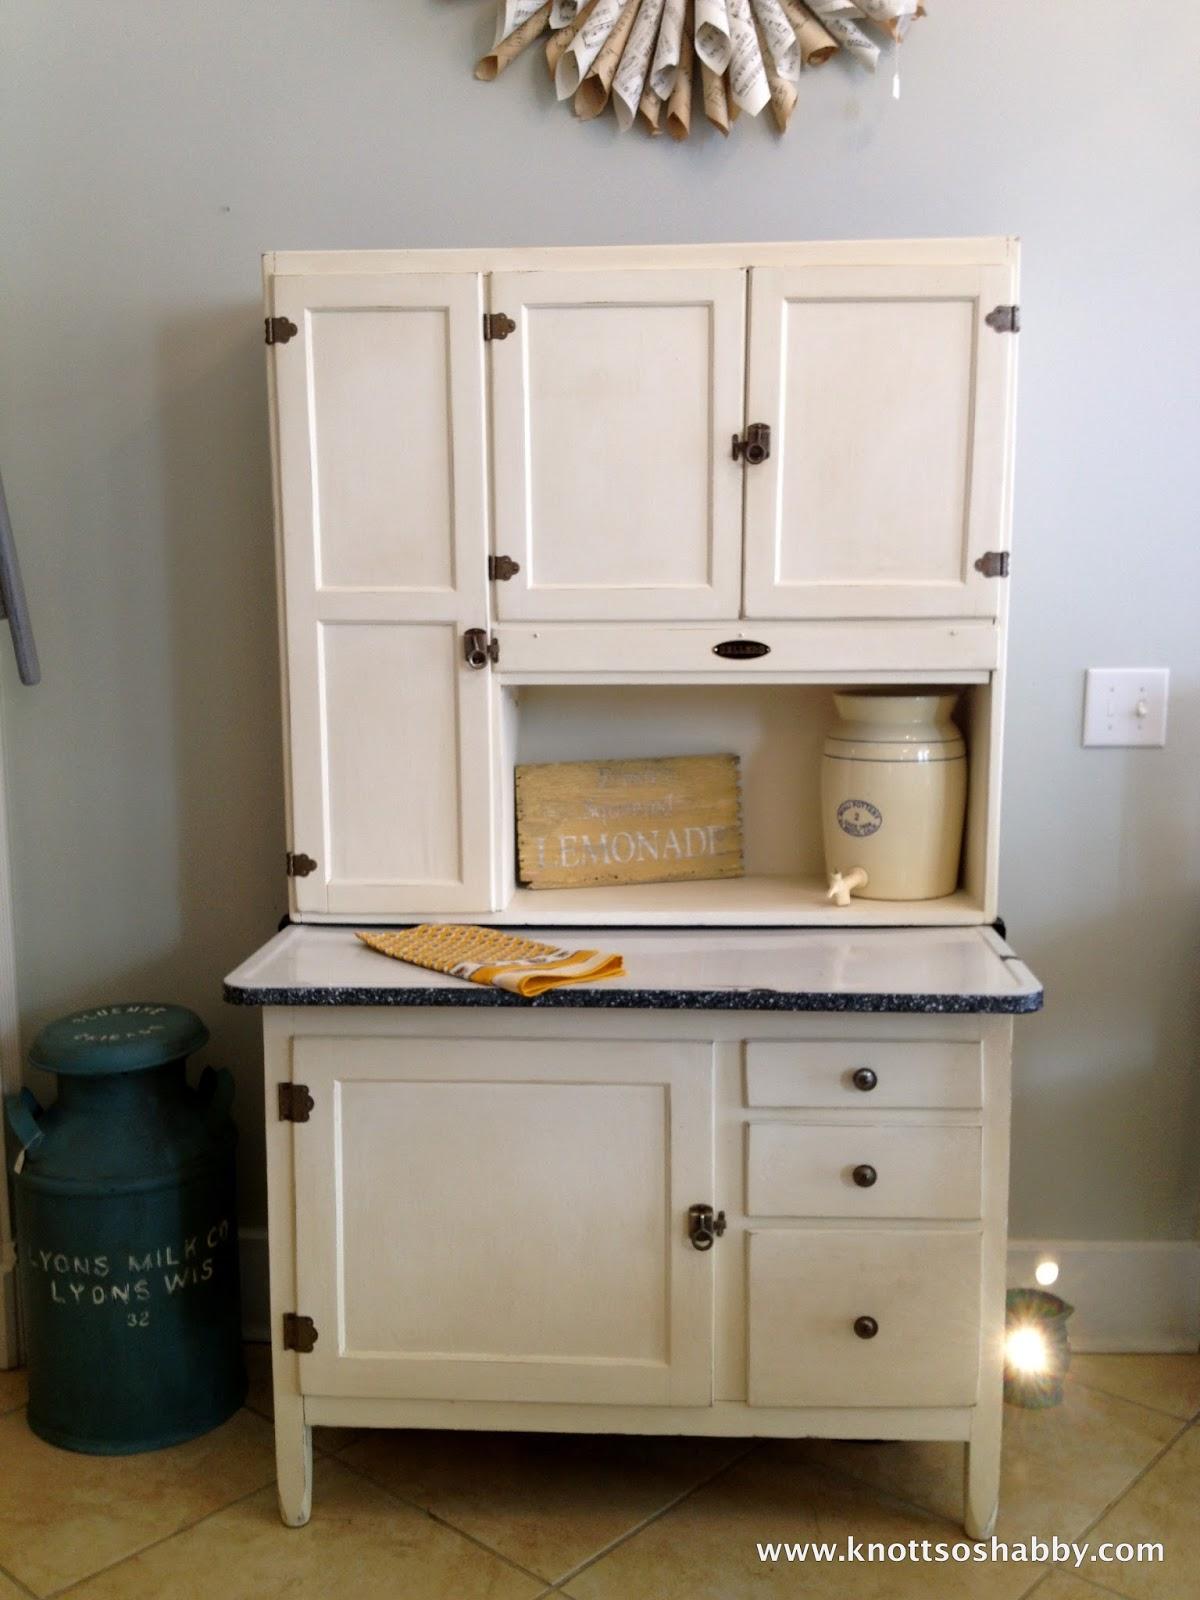 vintage retro 1950 39 s 60 39 s kitchen larder cabinet cupboard with drawers doors ebay. Black Bedroom Furniture Sets. Home Design Ideas